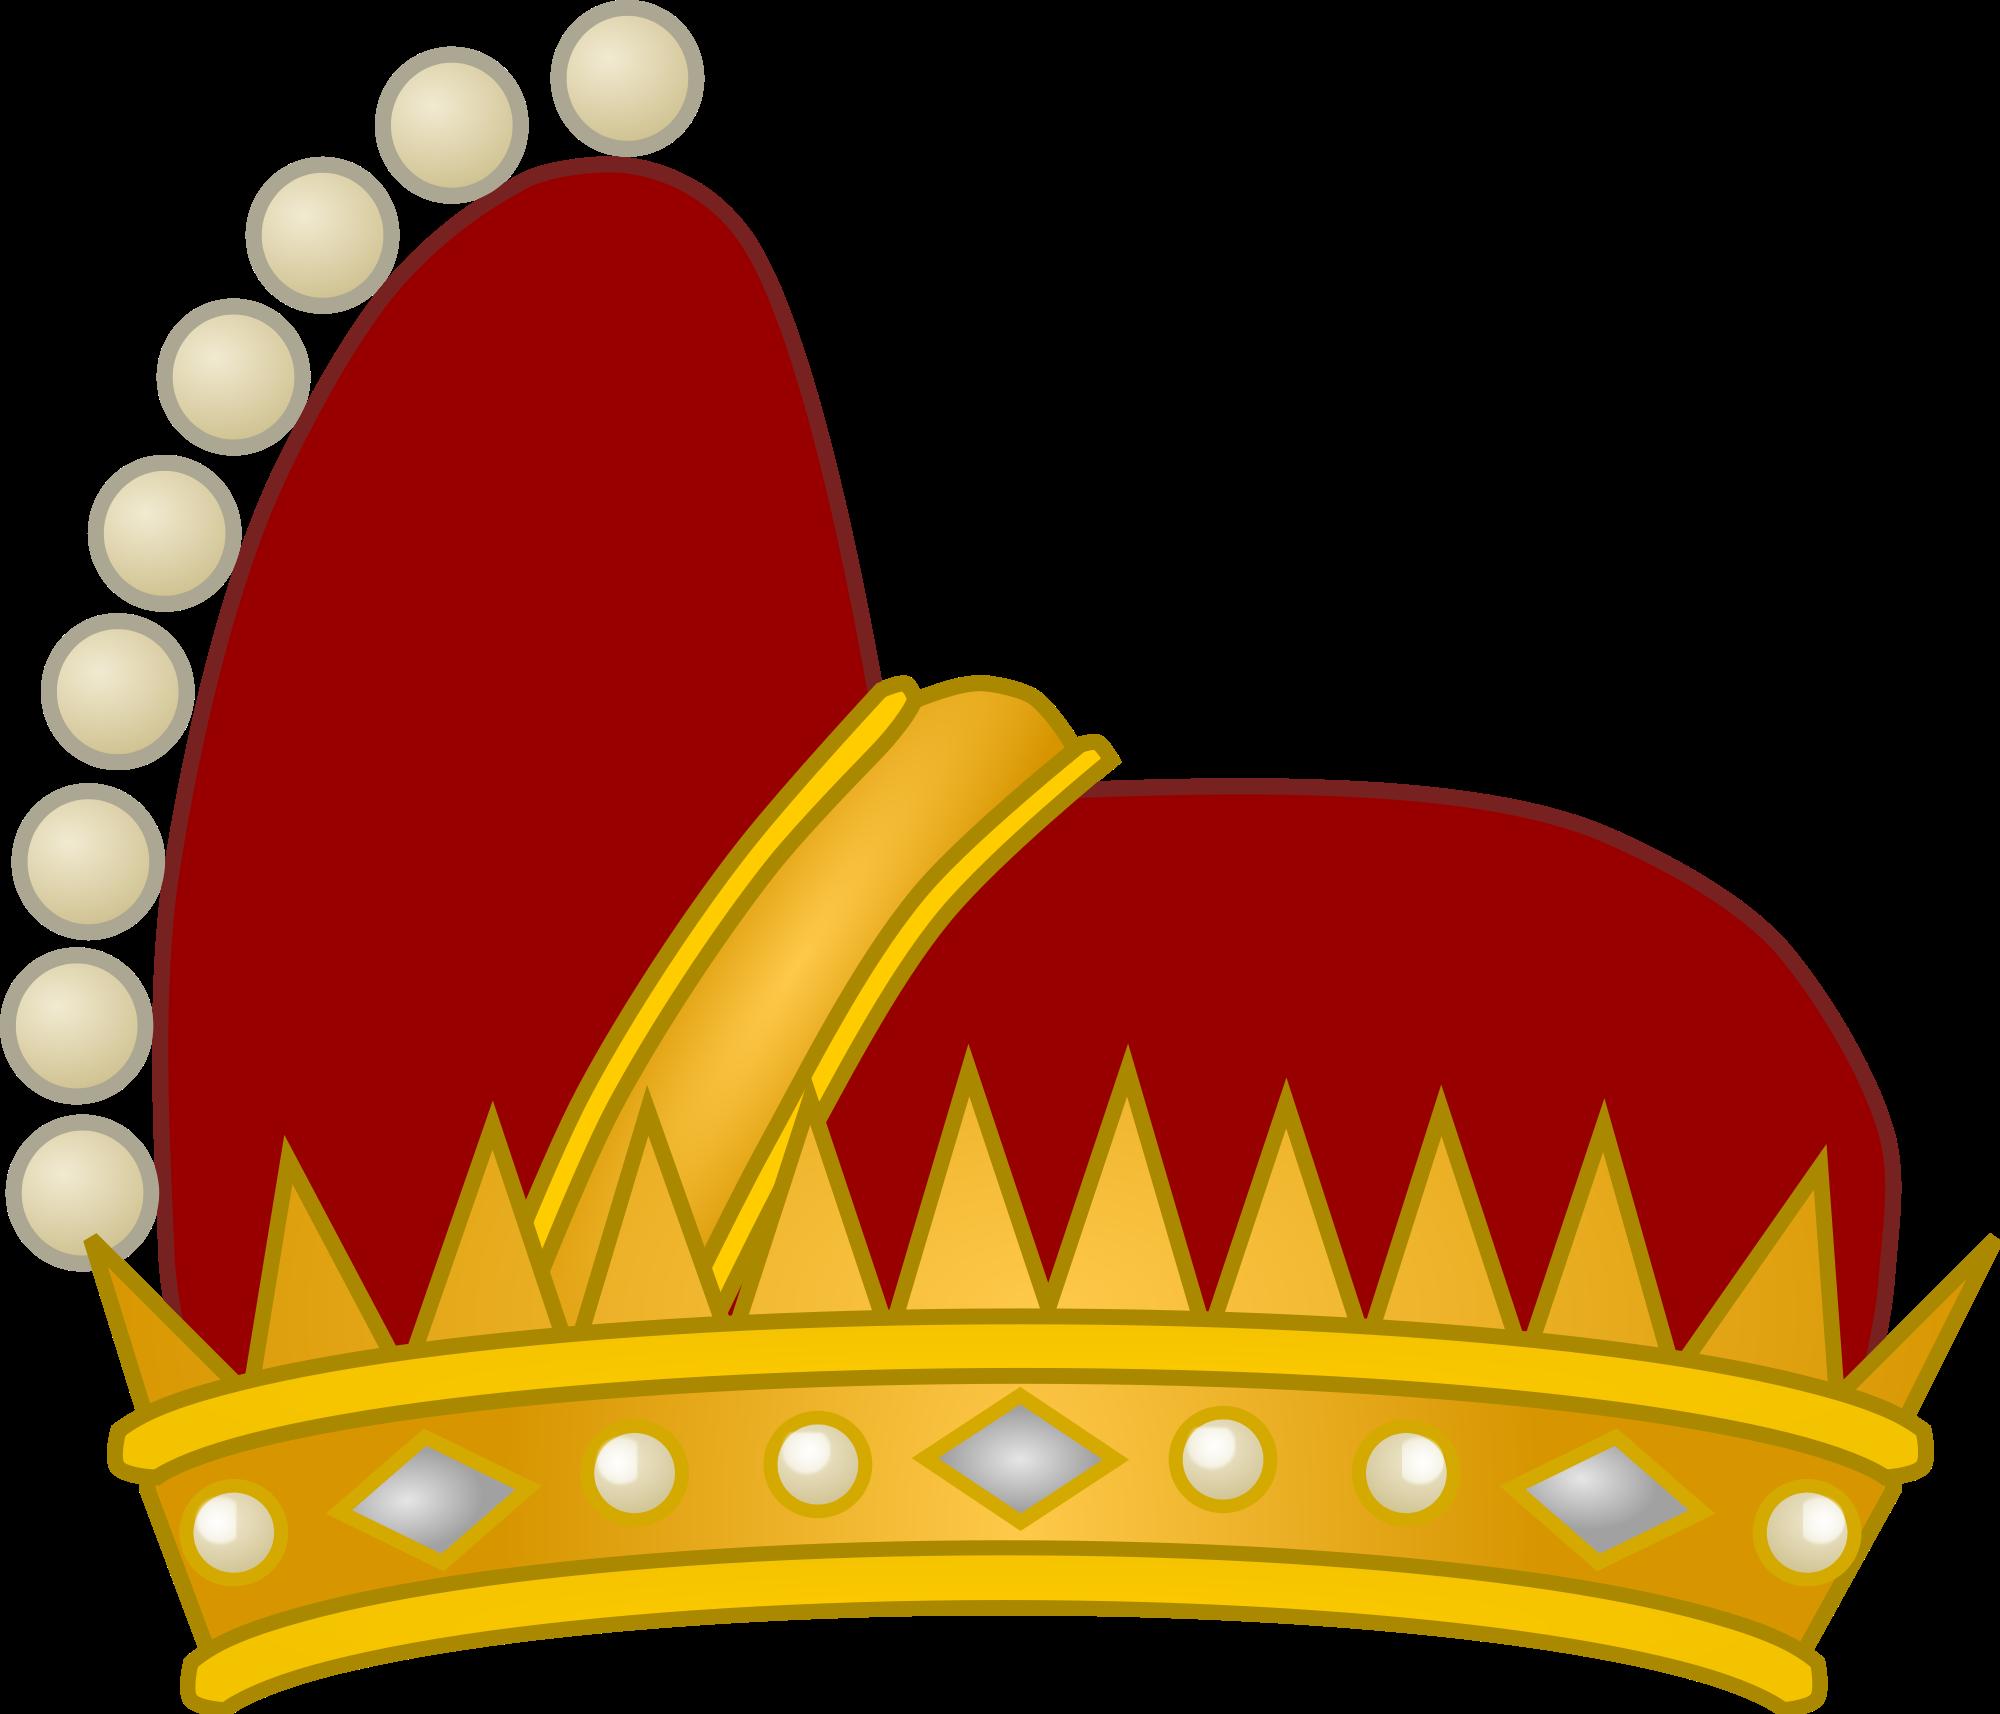 Halo clipart crown. File doge s svg